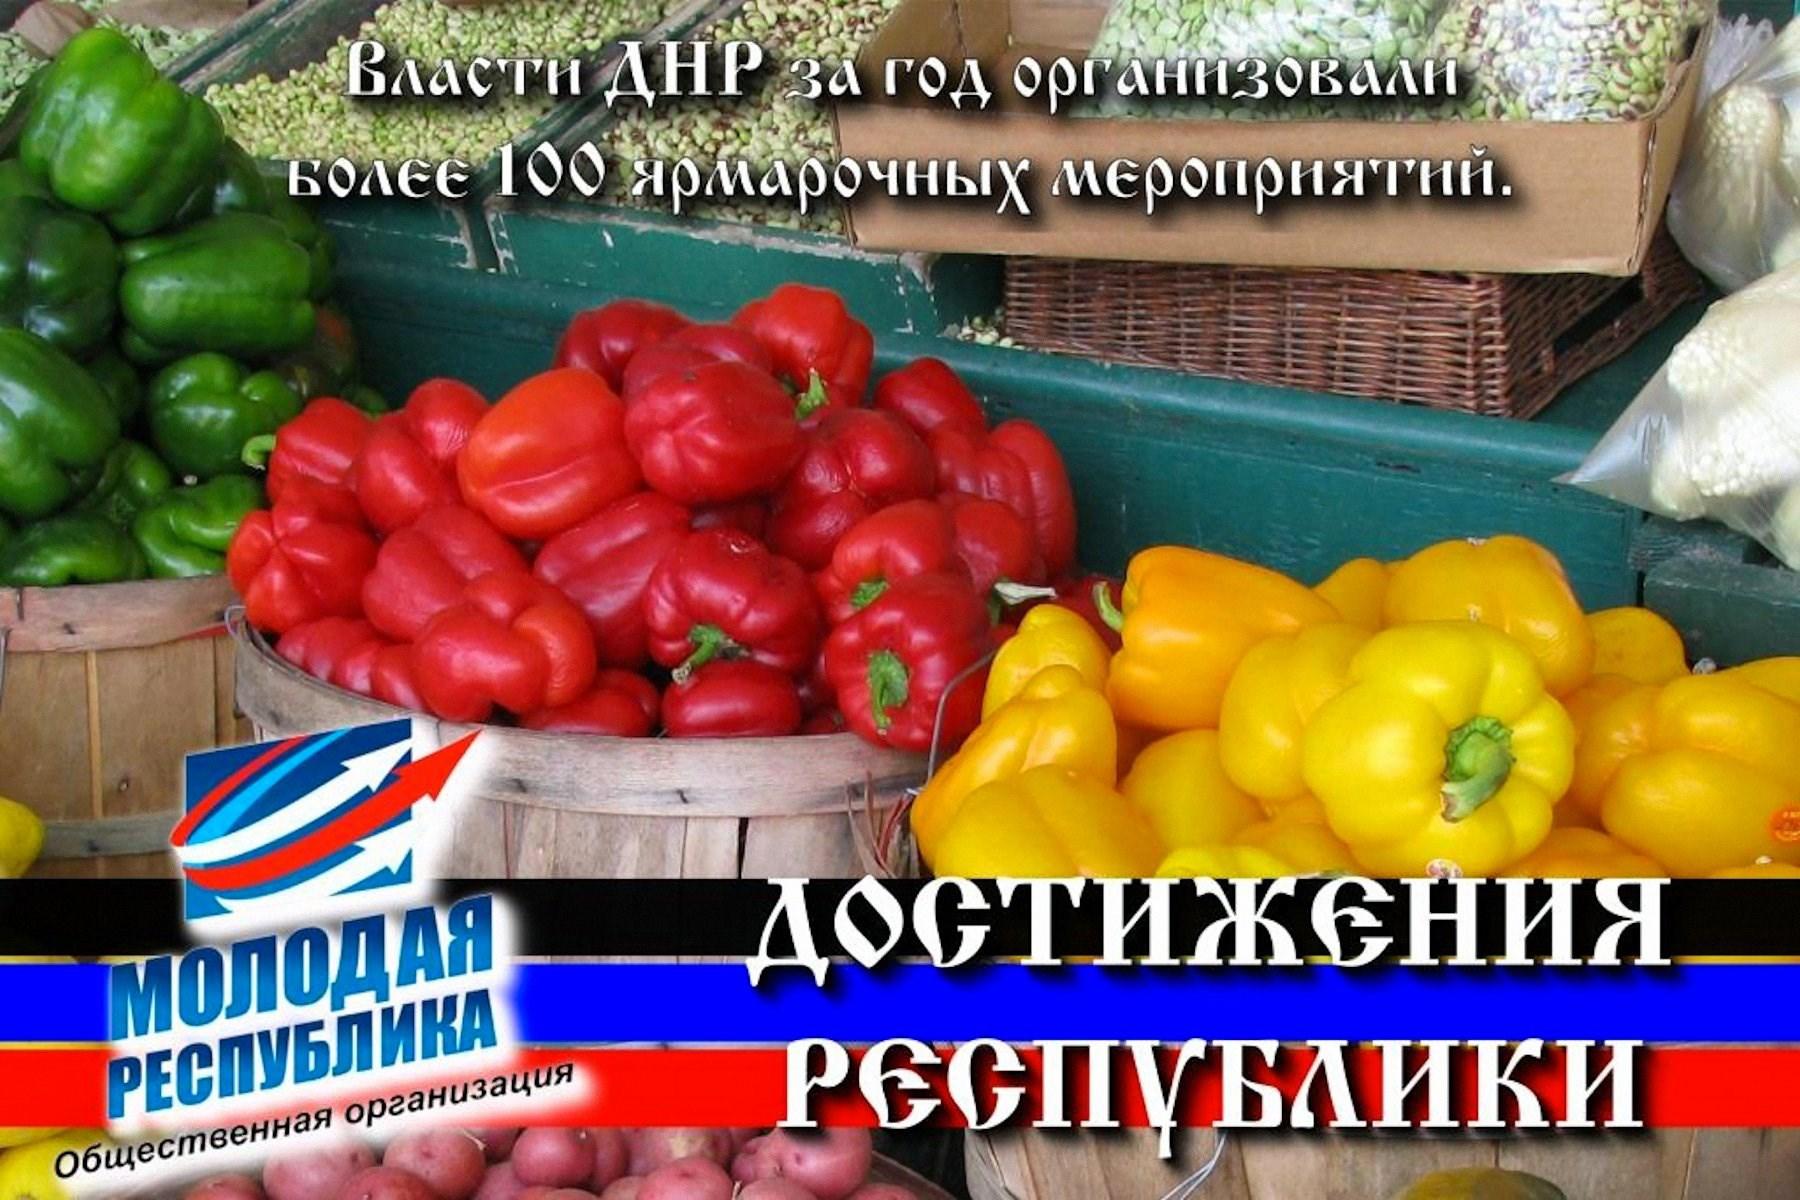 00 property of the republic dnr donetsk pr 03 280815